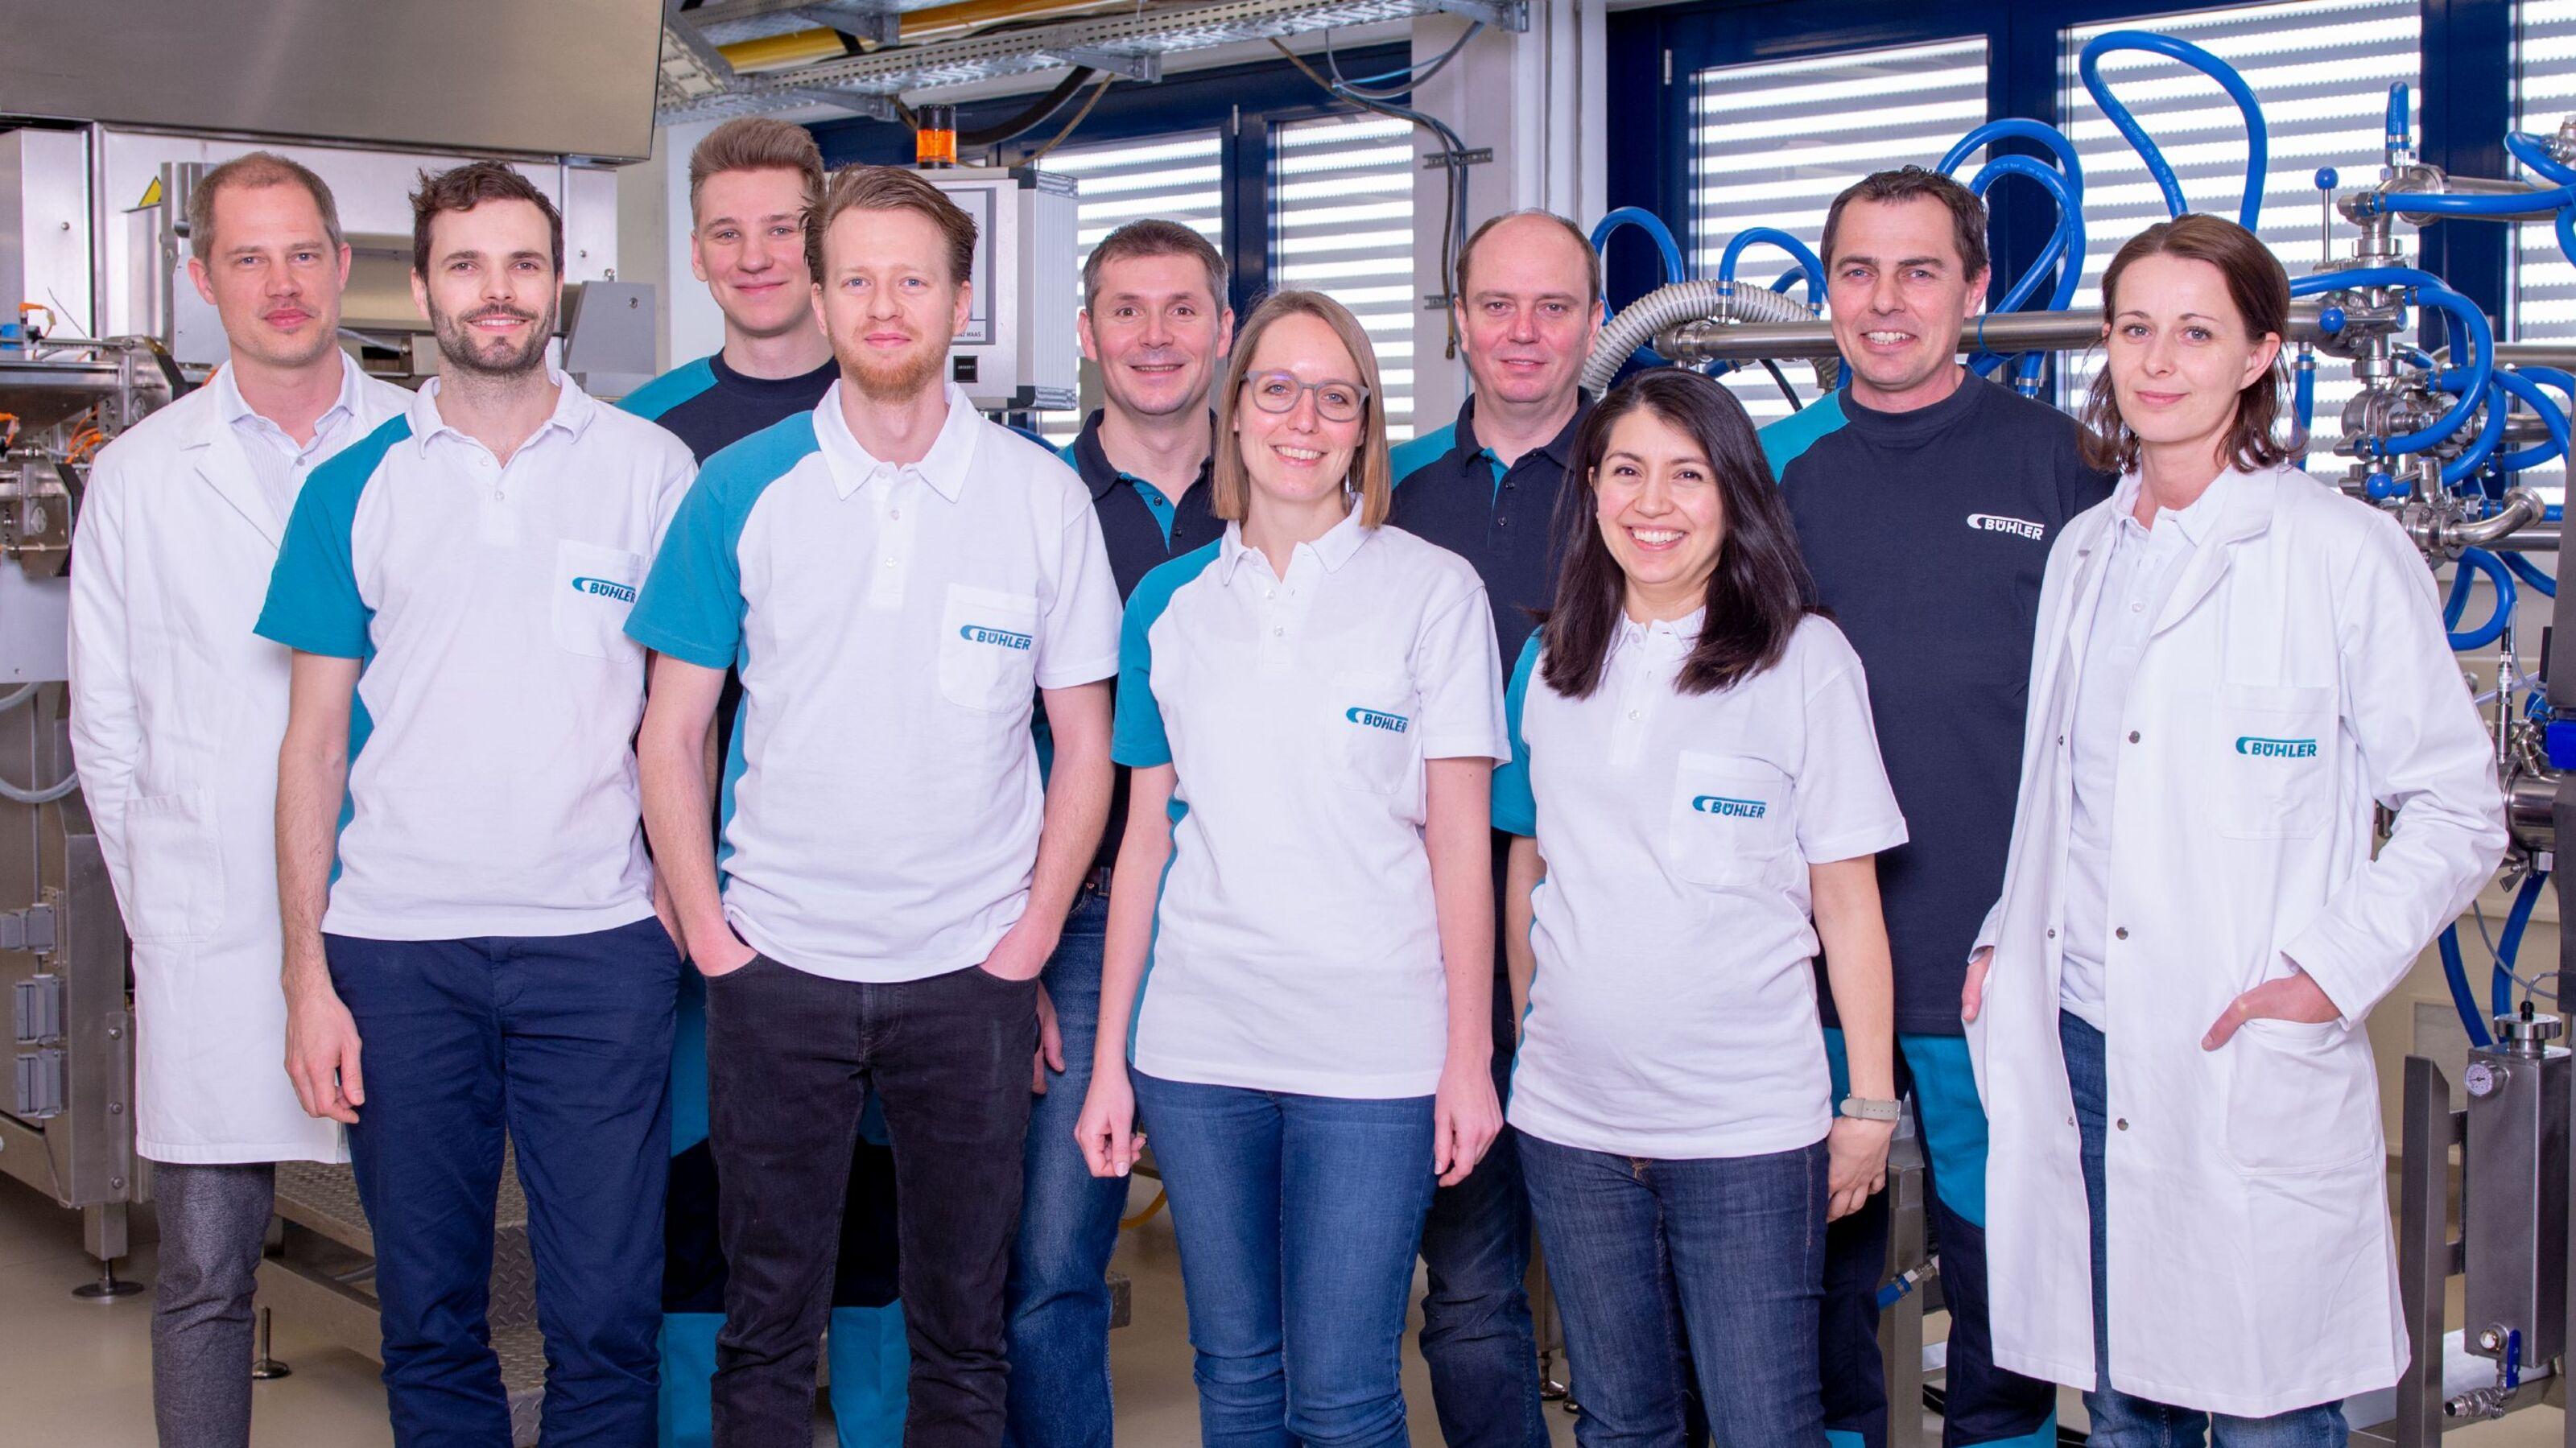 Bühler trainer and expert team.